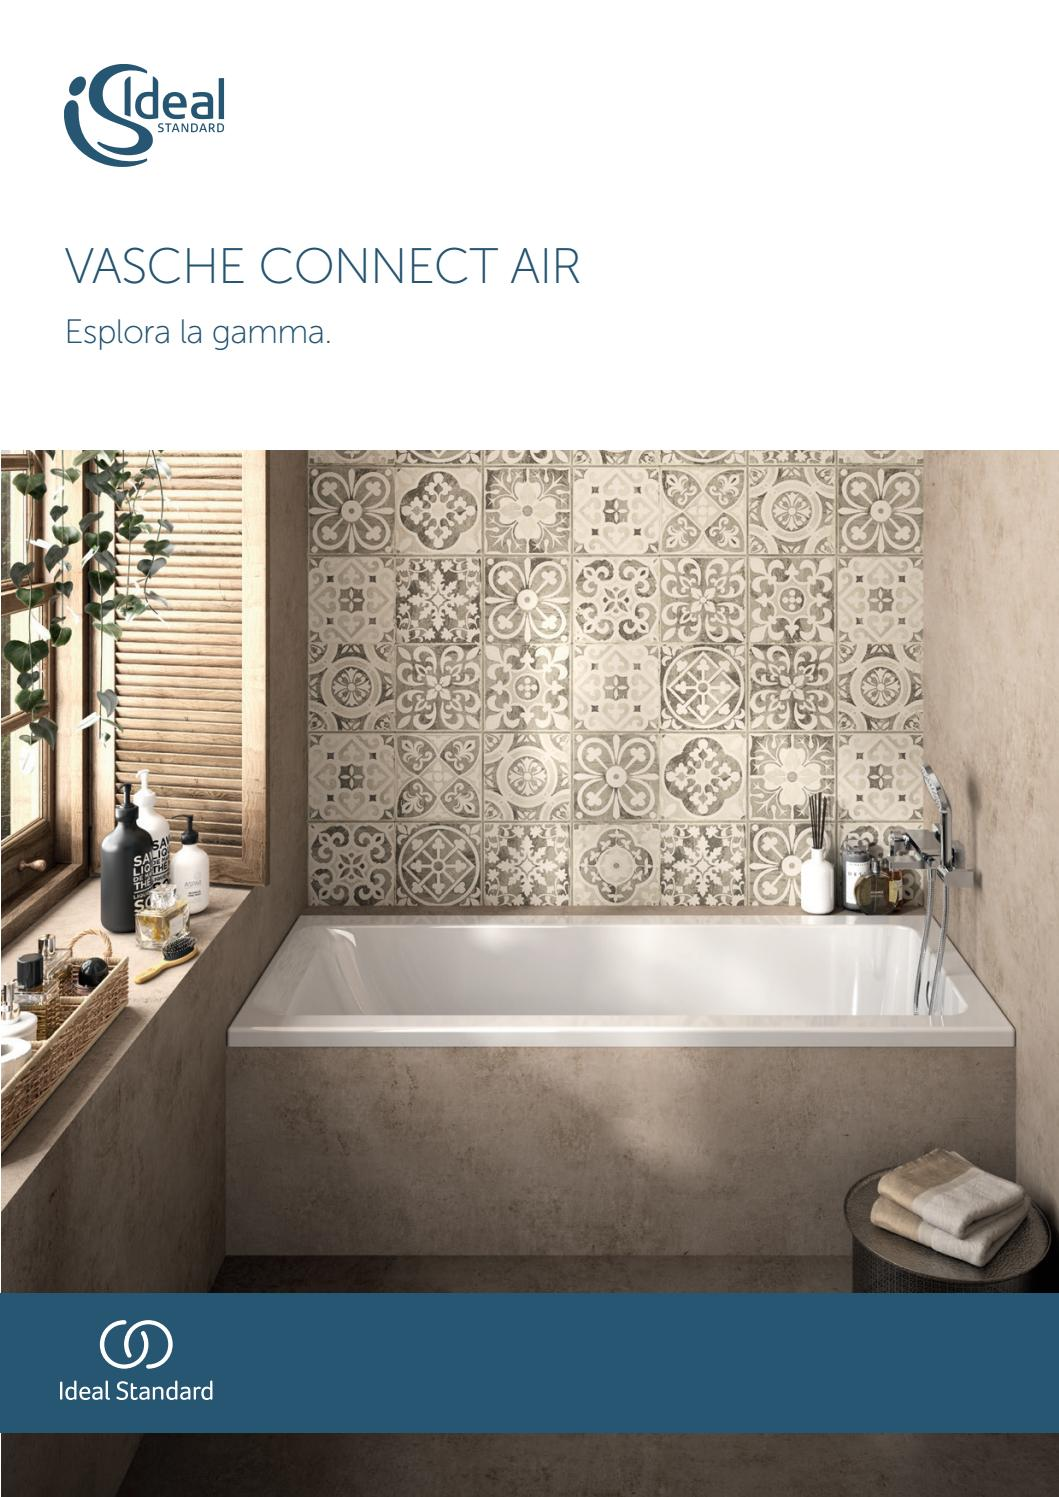 Vasca Da Bagno Misure Standard connect air vasche da bagno ideal standard :: jo-bagno.it by